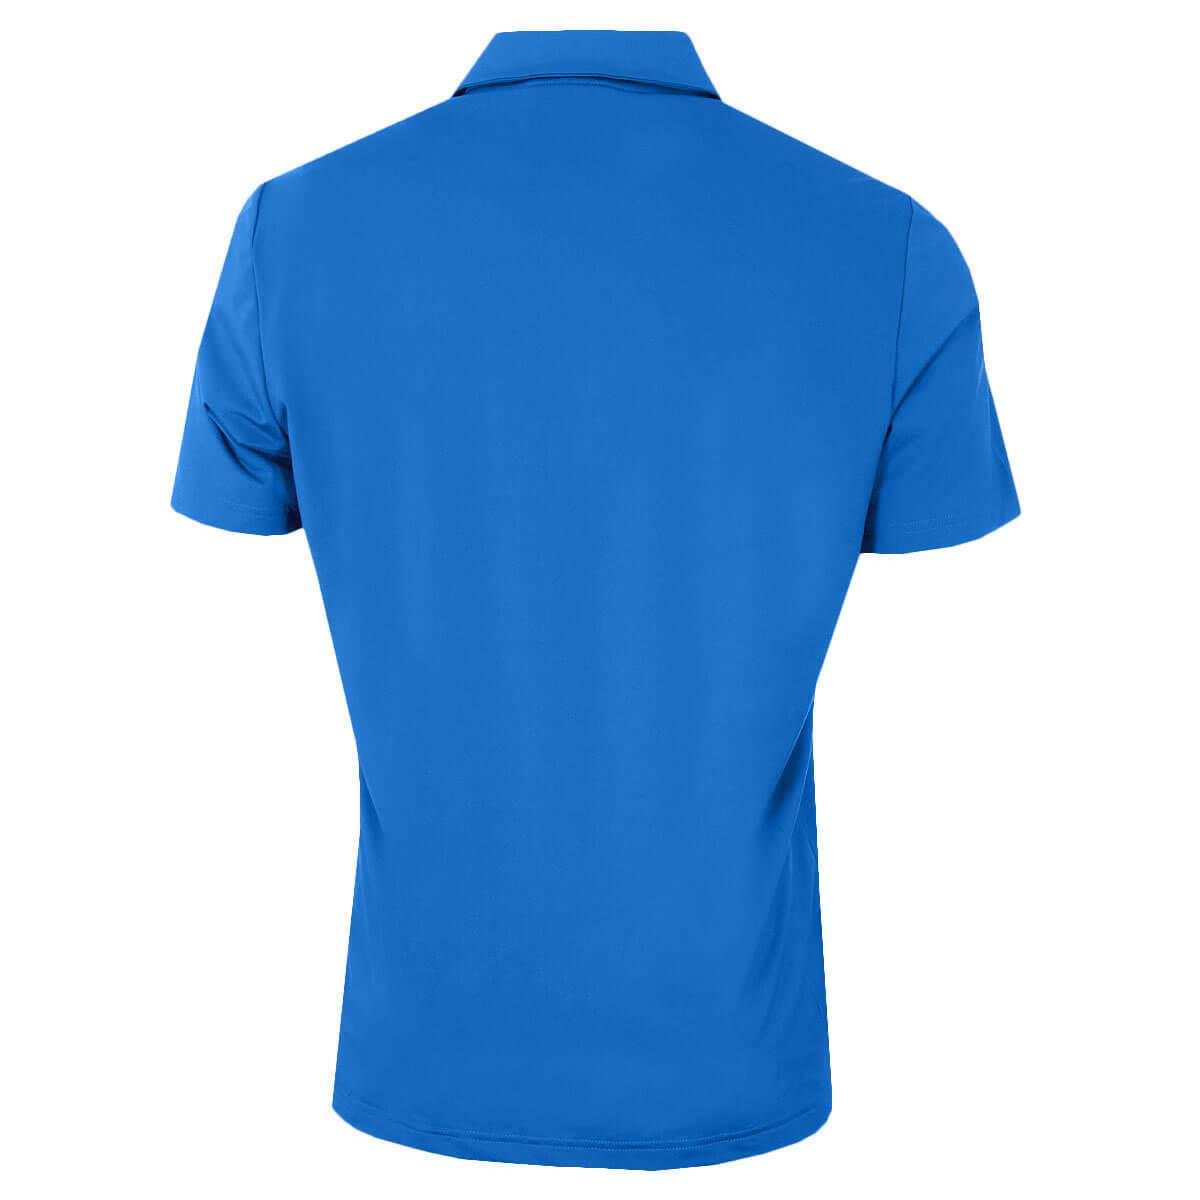 Adidas-Golf-Men-039-s-Ultimate-2-0-Solid-Crestable-Polo-Shirt thumbnail 5